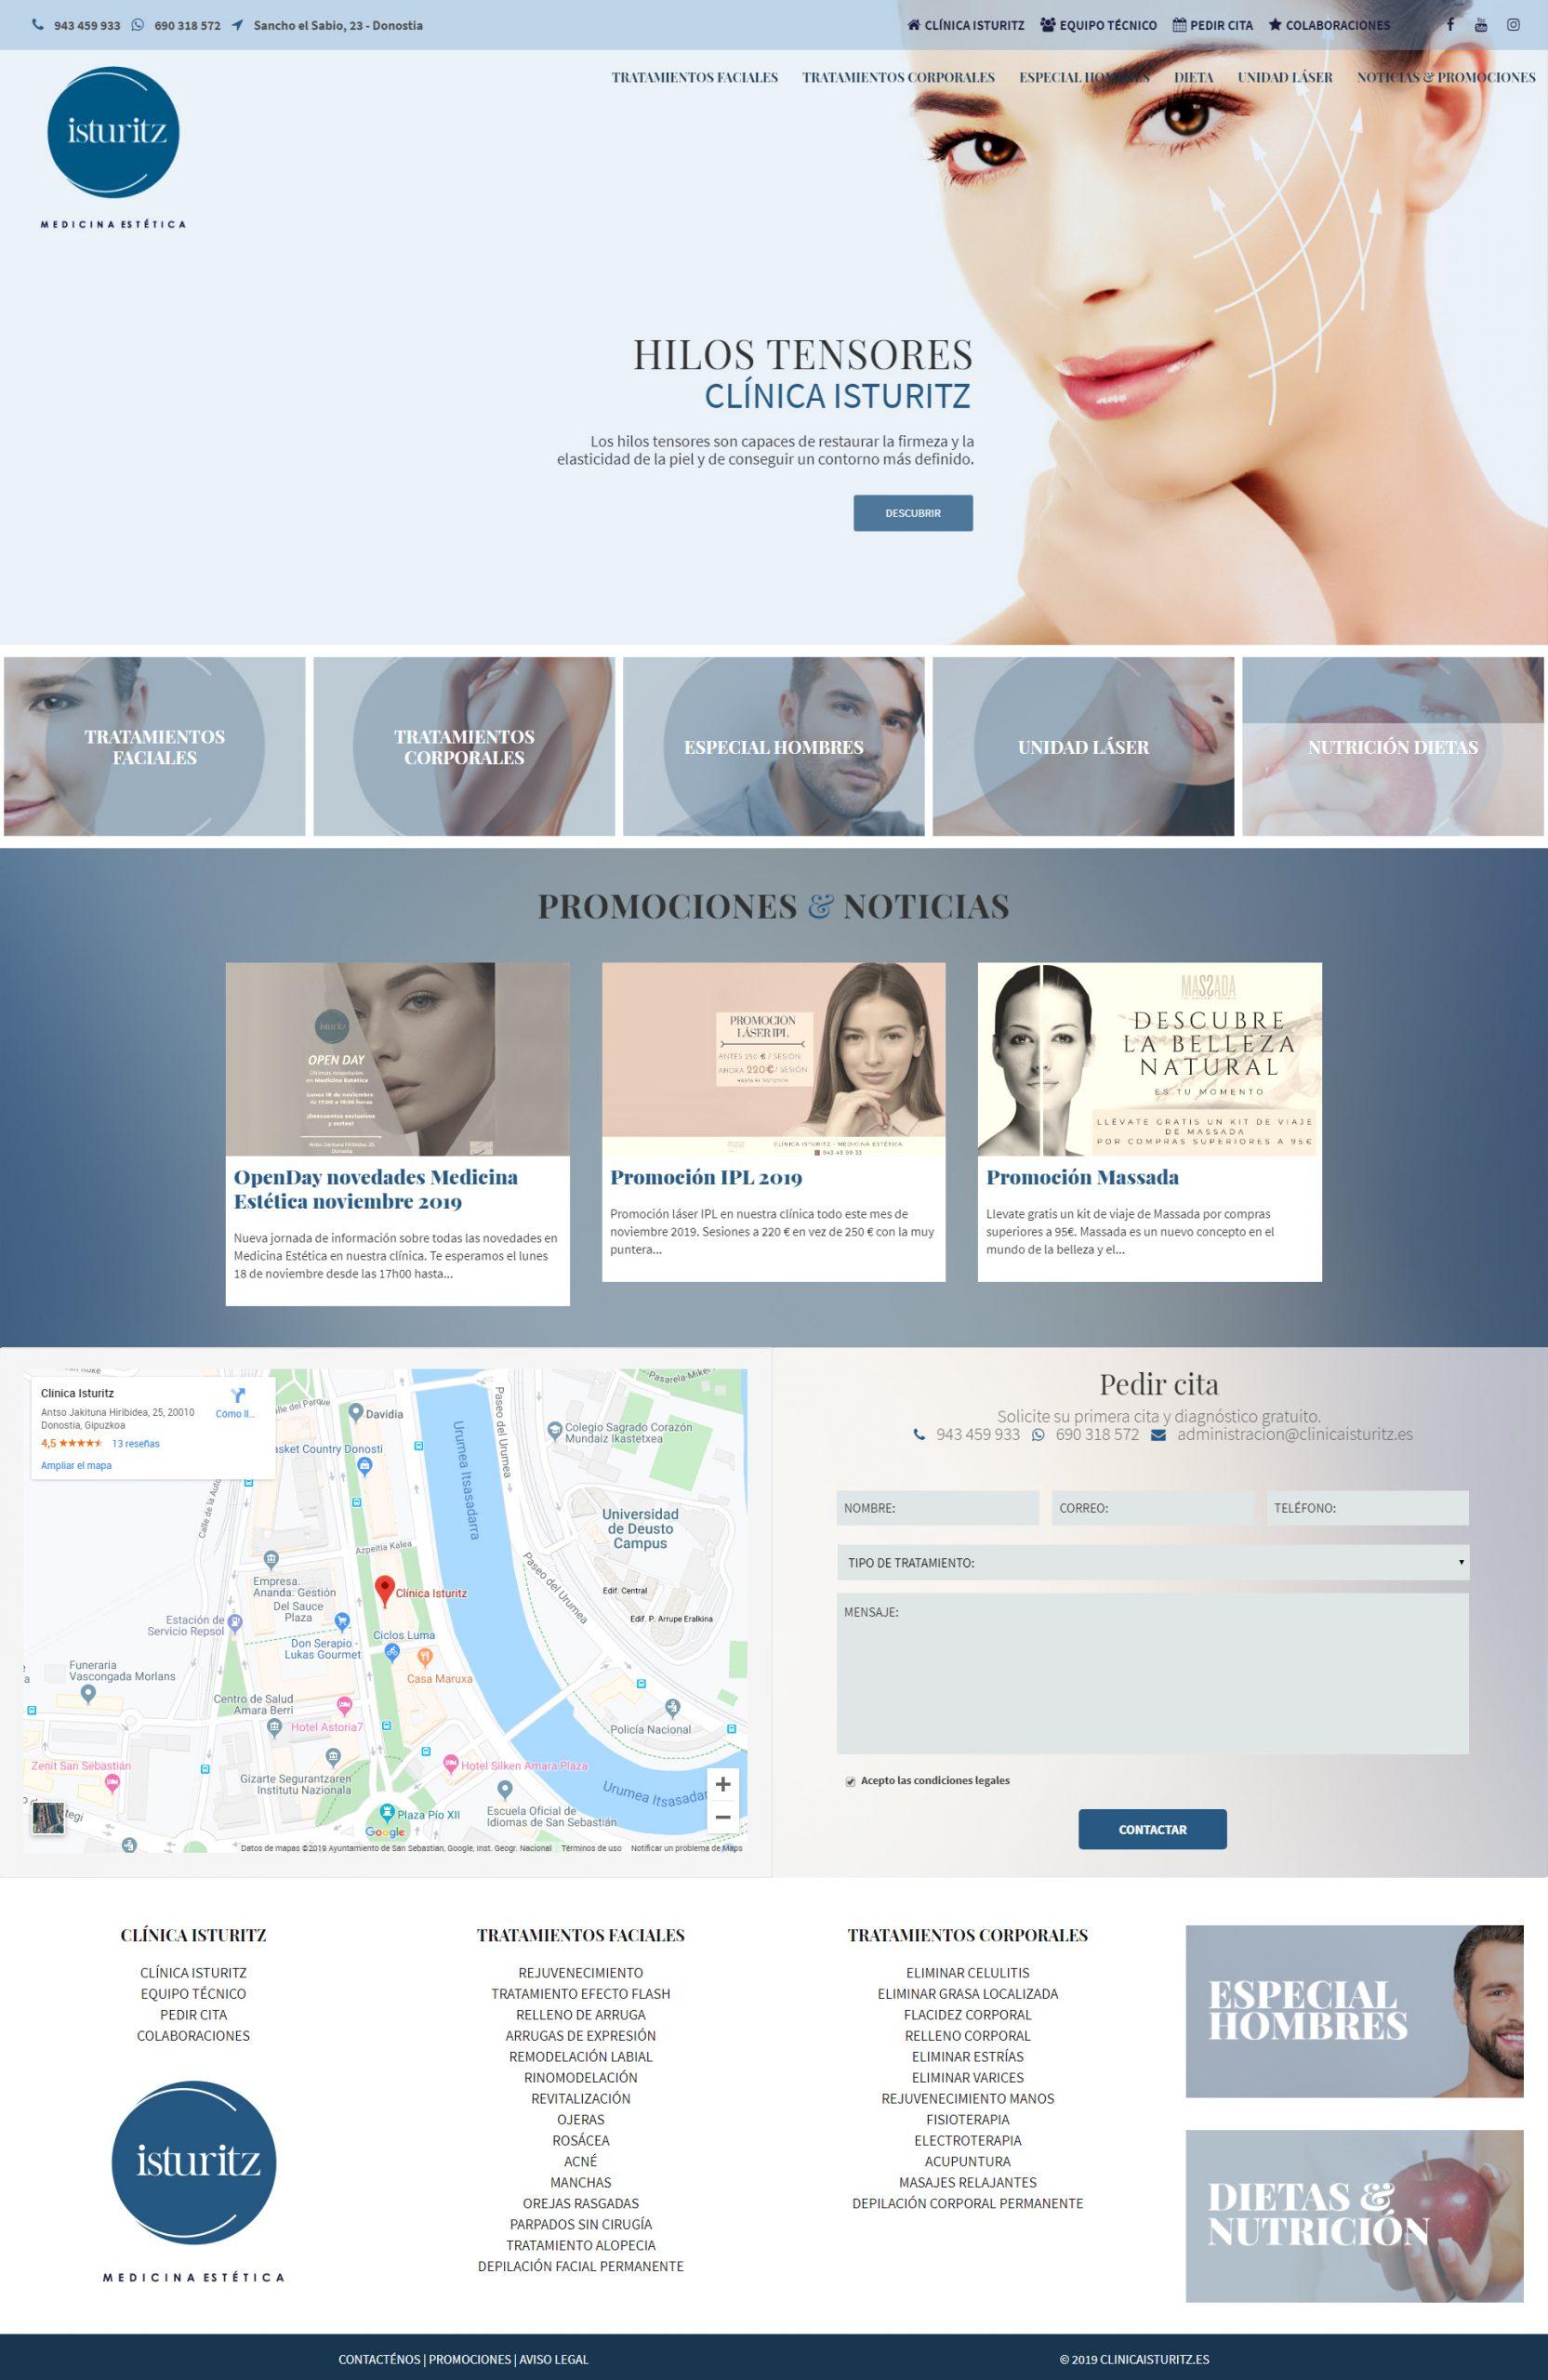 Clínica Isturiz   DIGITAL CHILLS Diseño & Marketing Digital